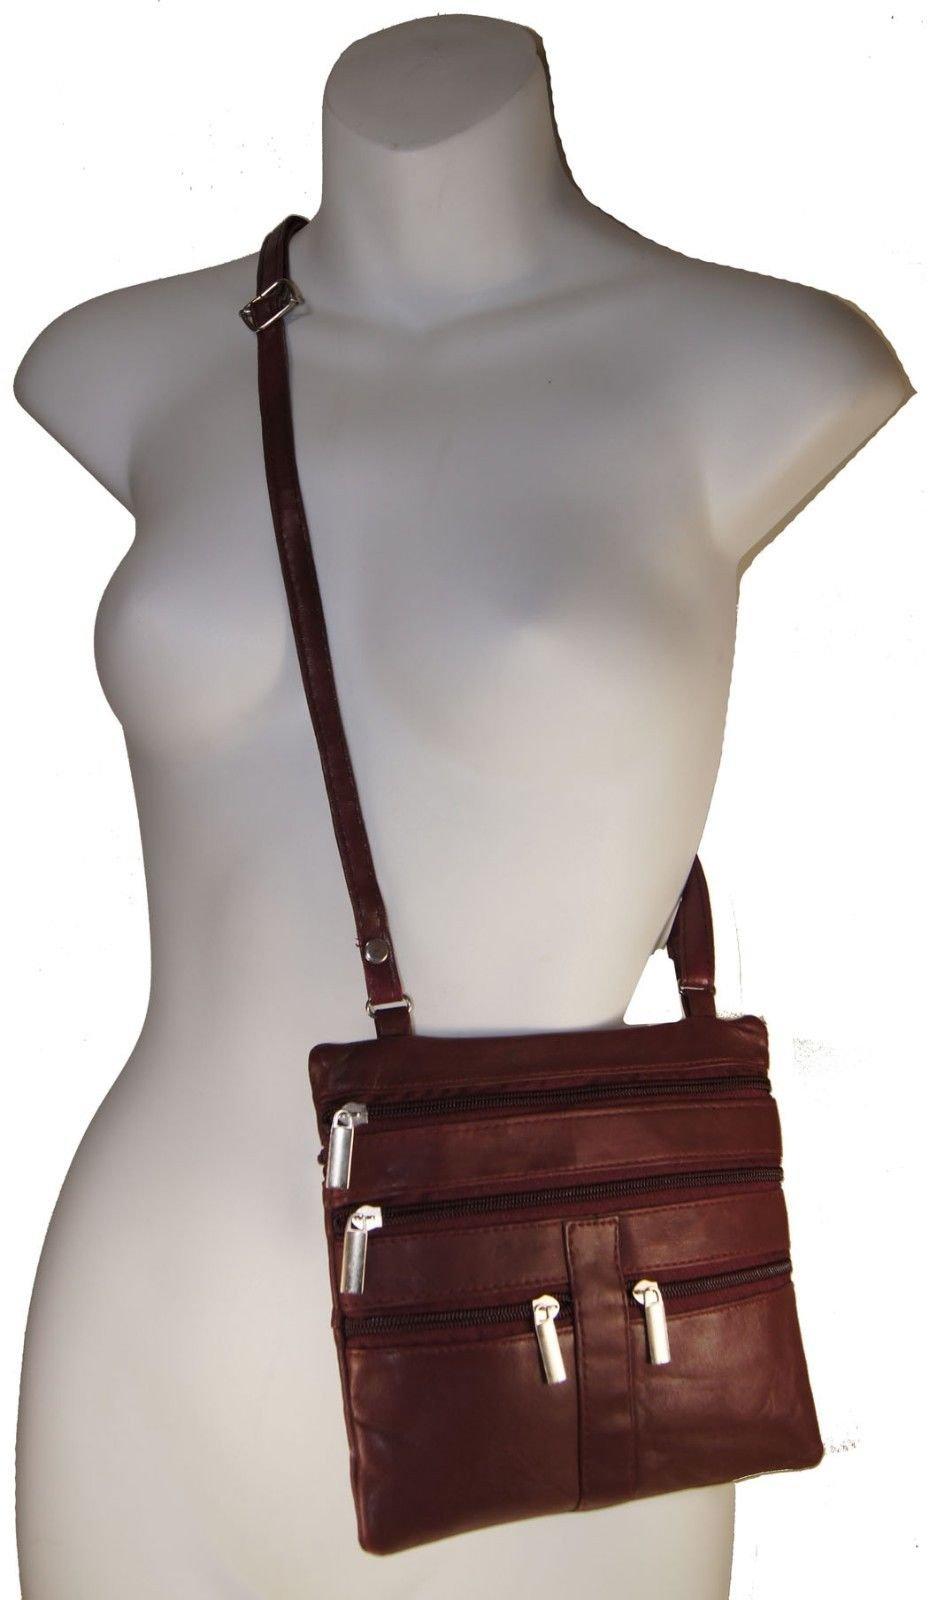 Cherry Ladies Genuine Leather Cross Body Bag Satchel Messenger Bag 48'' Strap